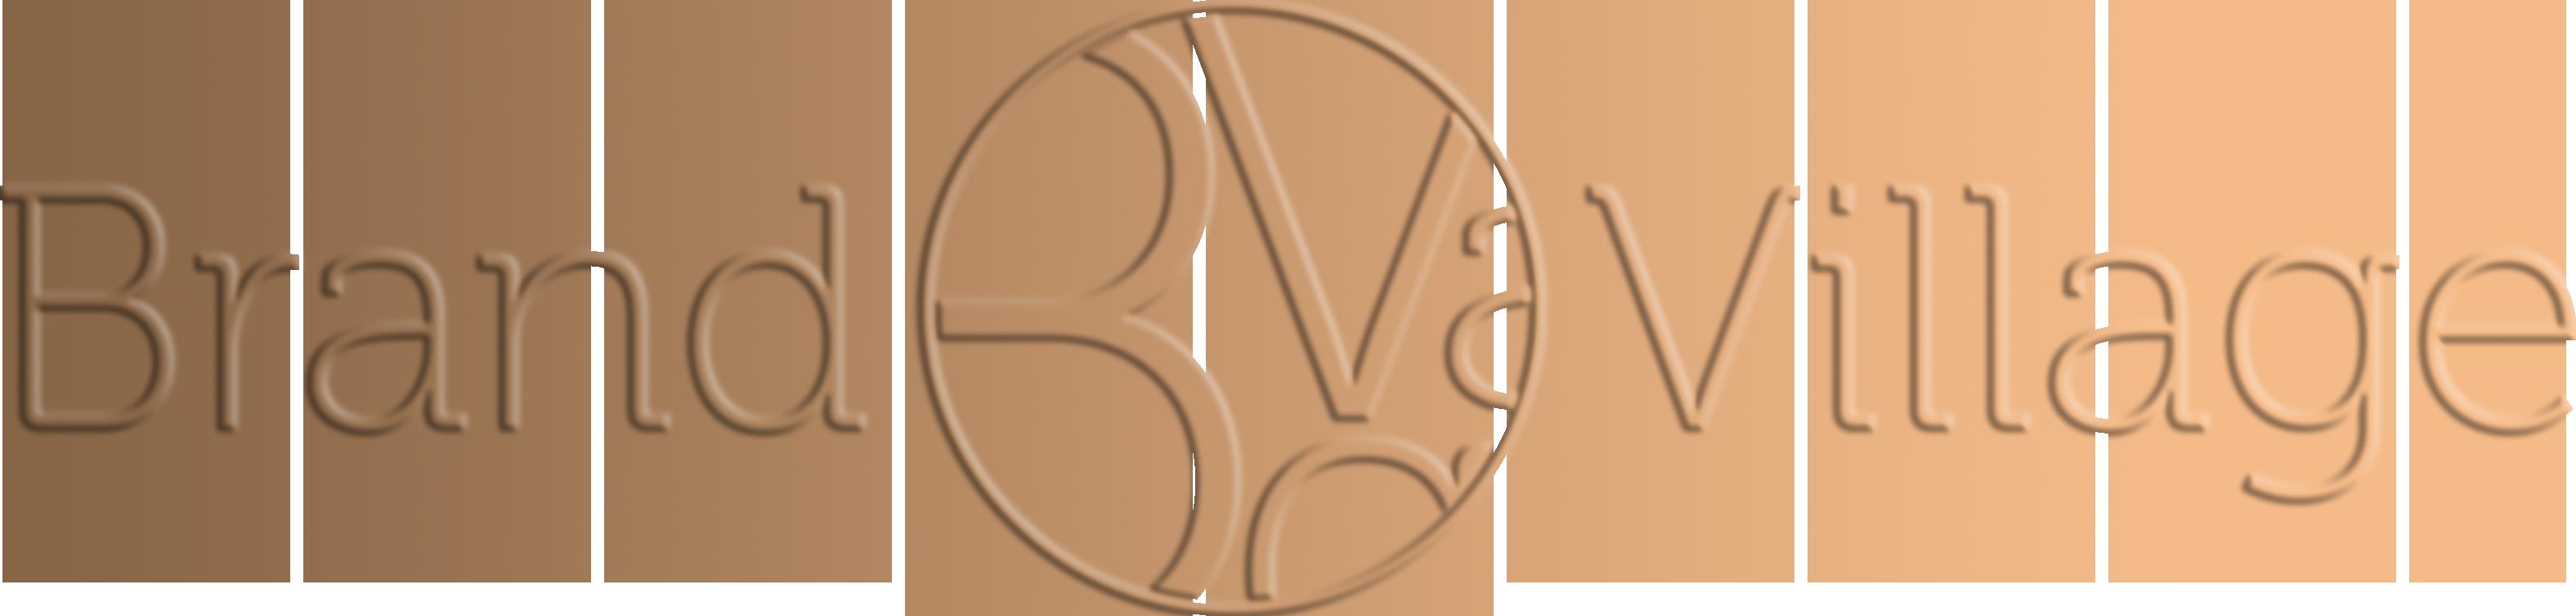 logo brandvillage